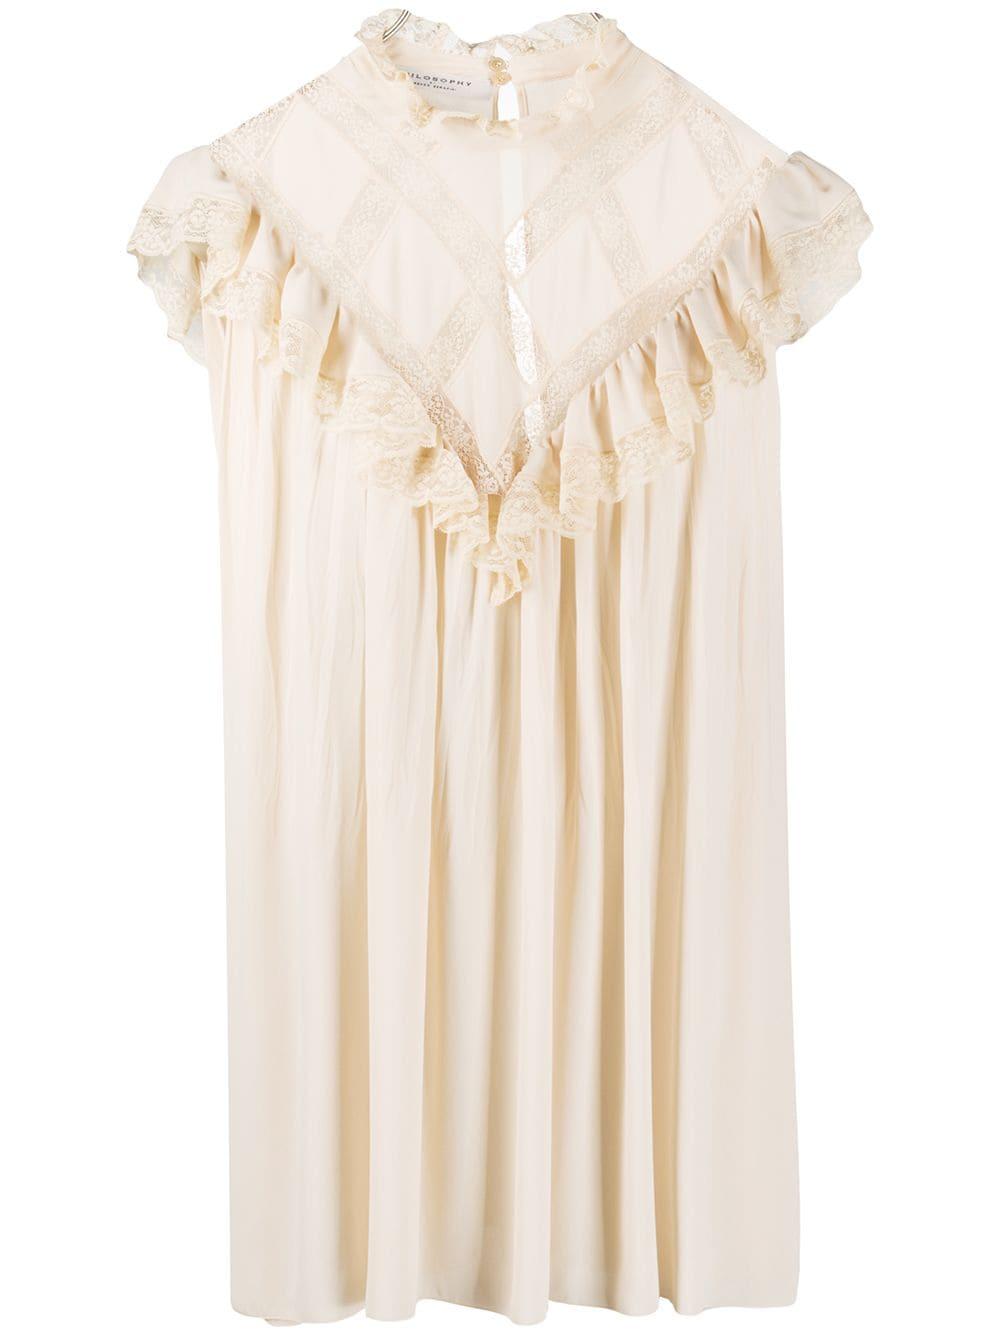 PHILOSOPHY di LORENZO SERAFINI | Dress | A044557189